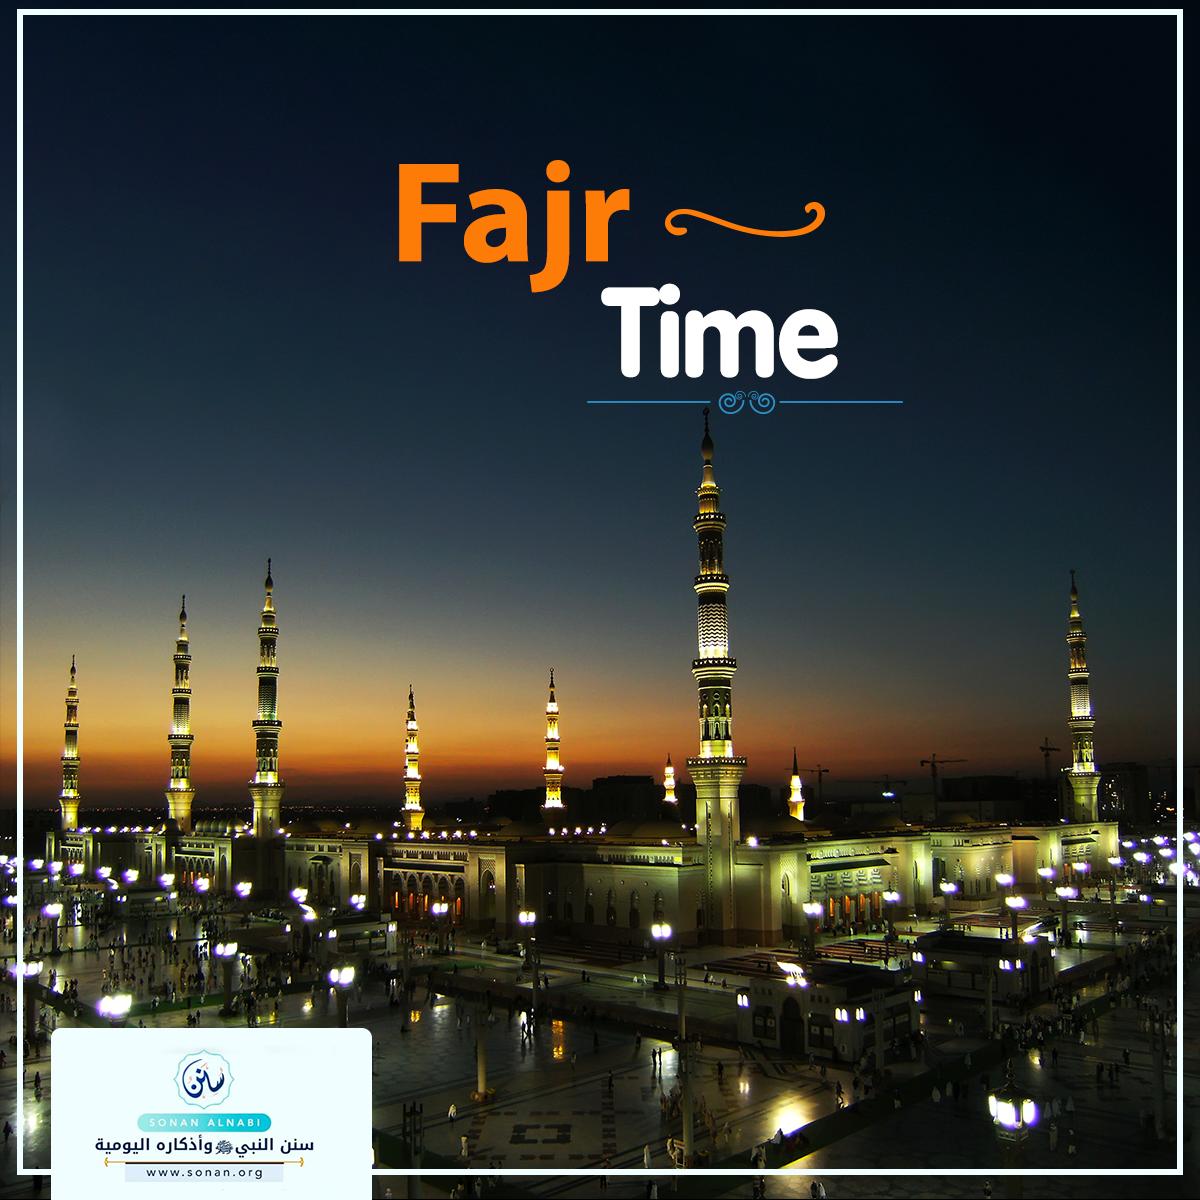 Fajr Time